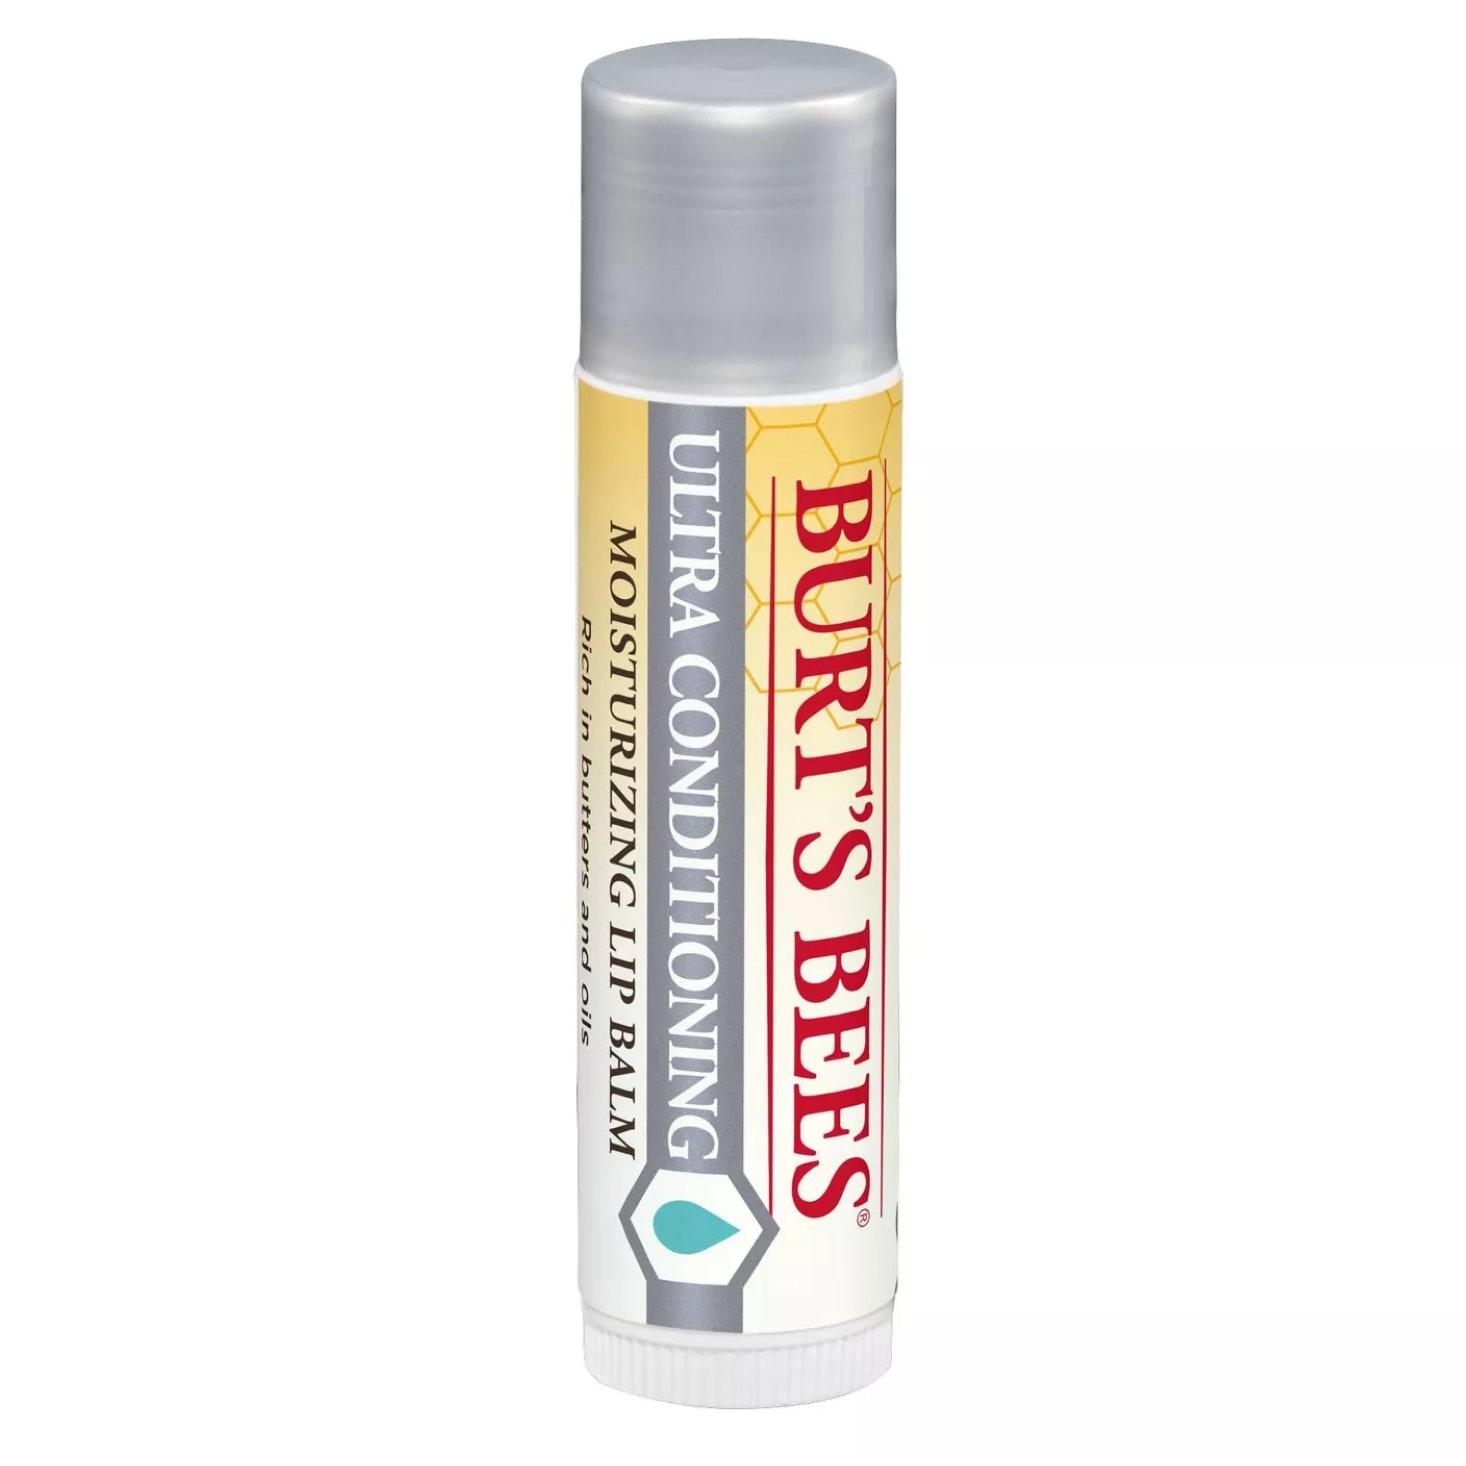 Burt's Bees® Ultra Conditioning Moisturizing Lip Balm